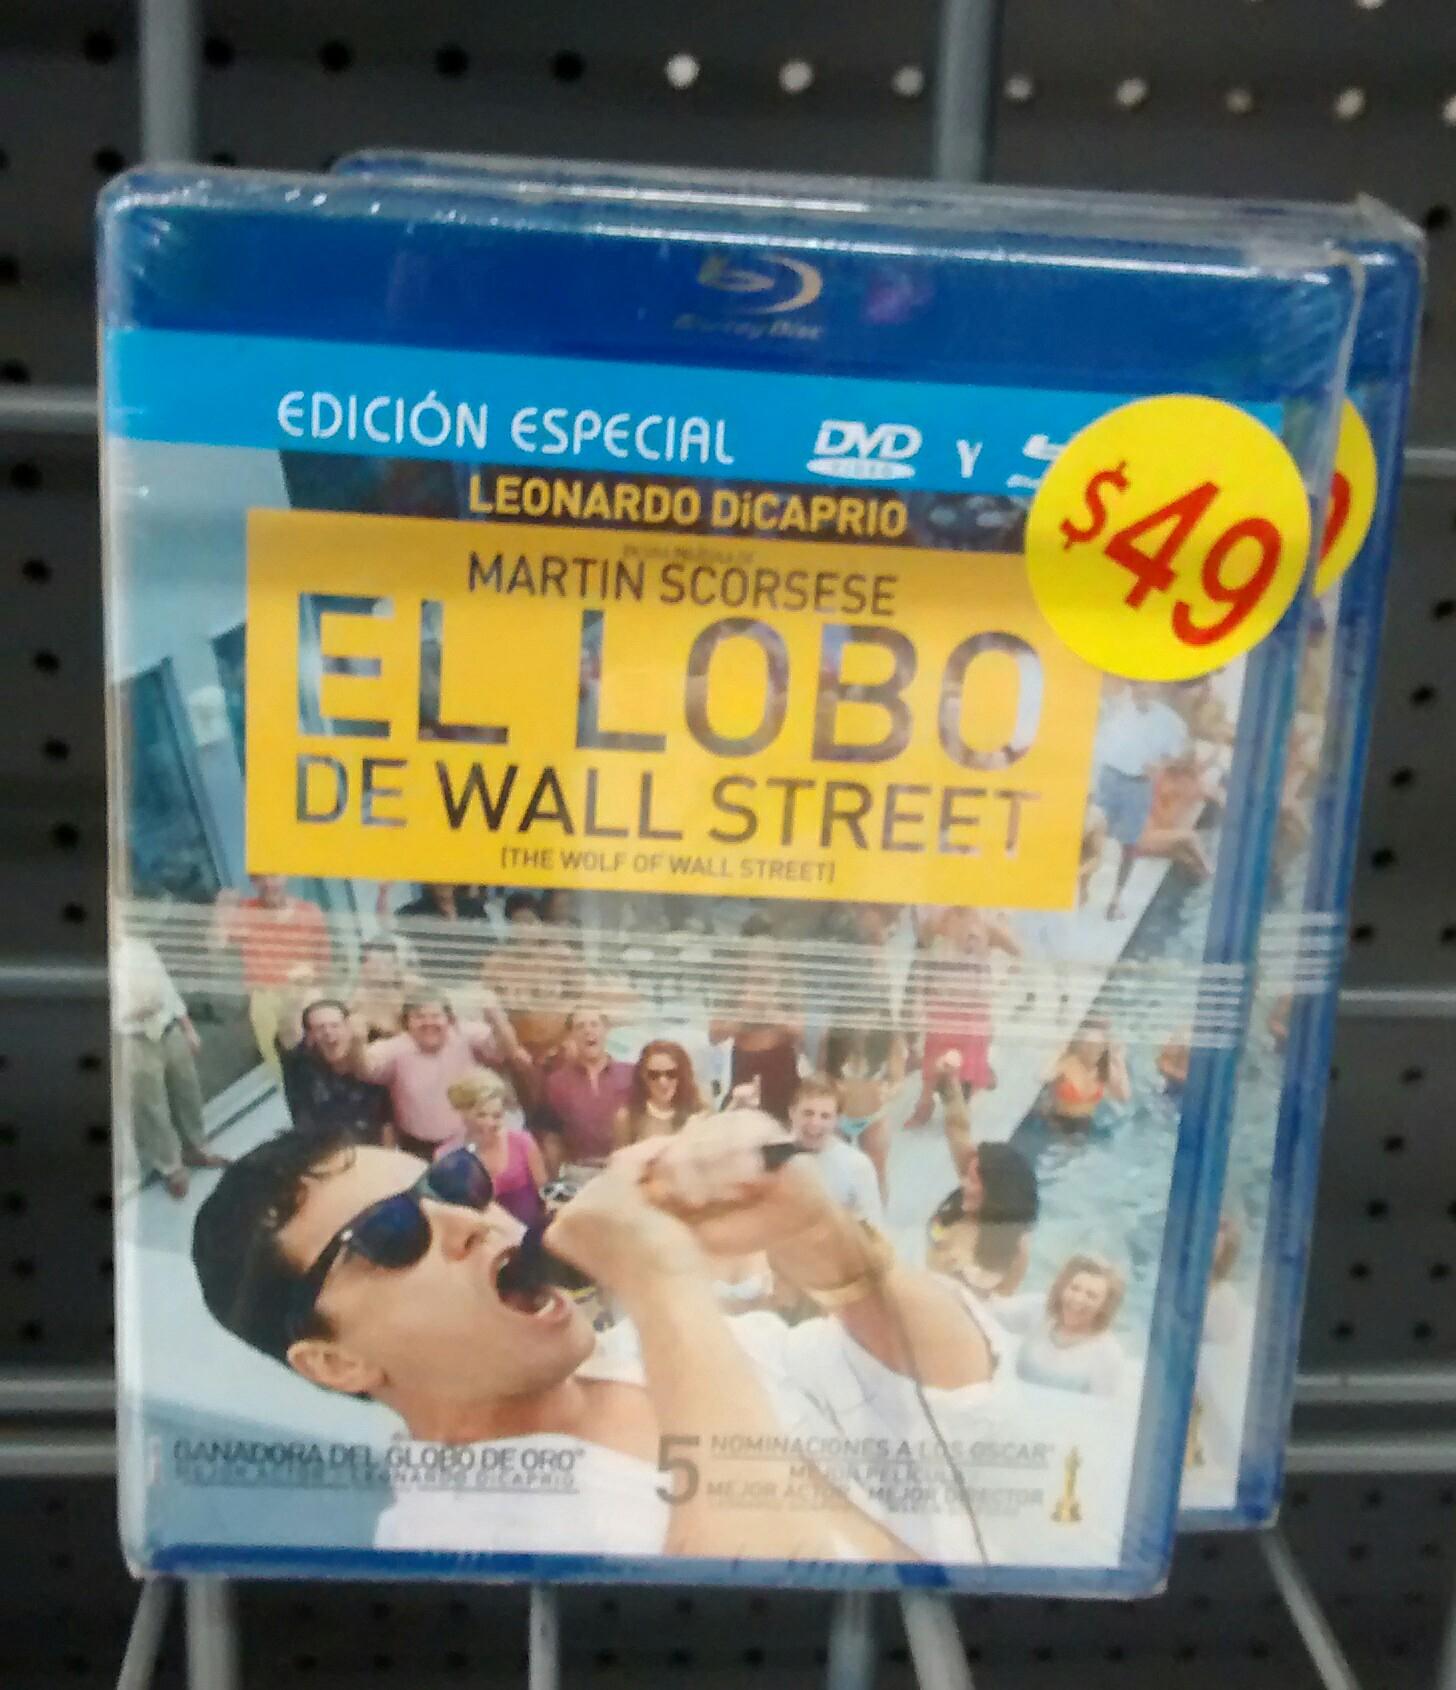 Soriana: El Lobo de Wall Street Blu Ray + DVD a $49 pesos